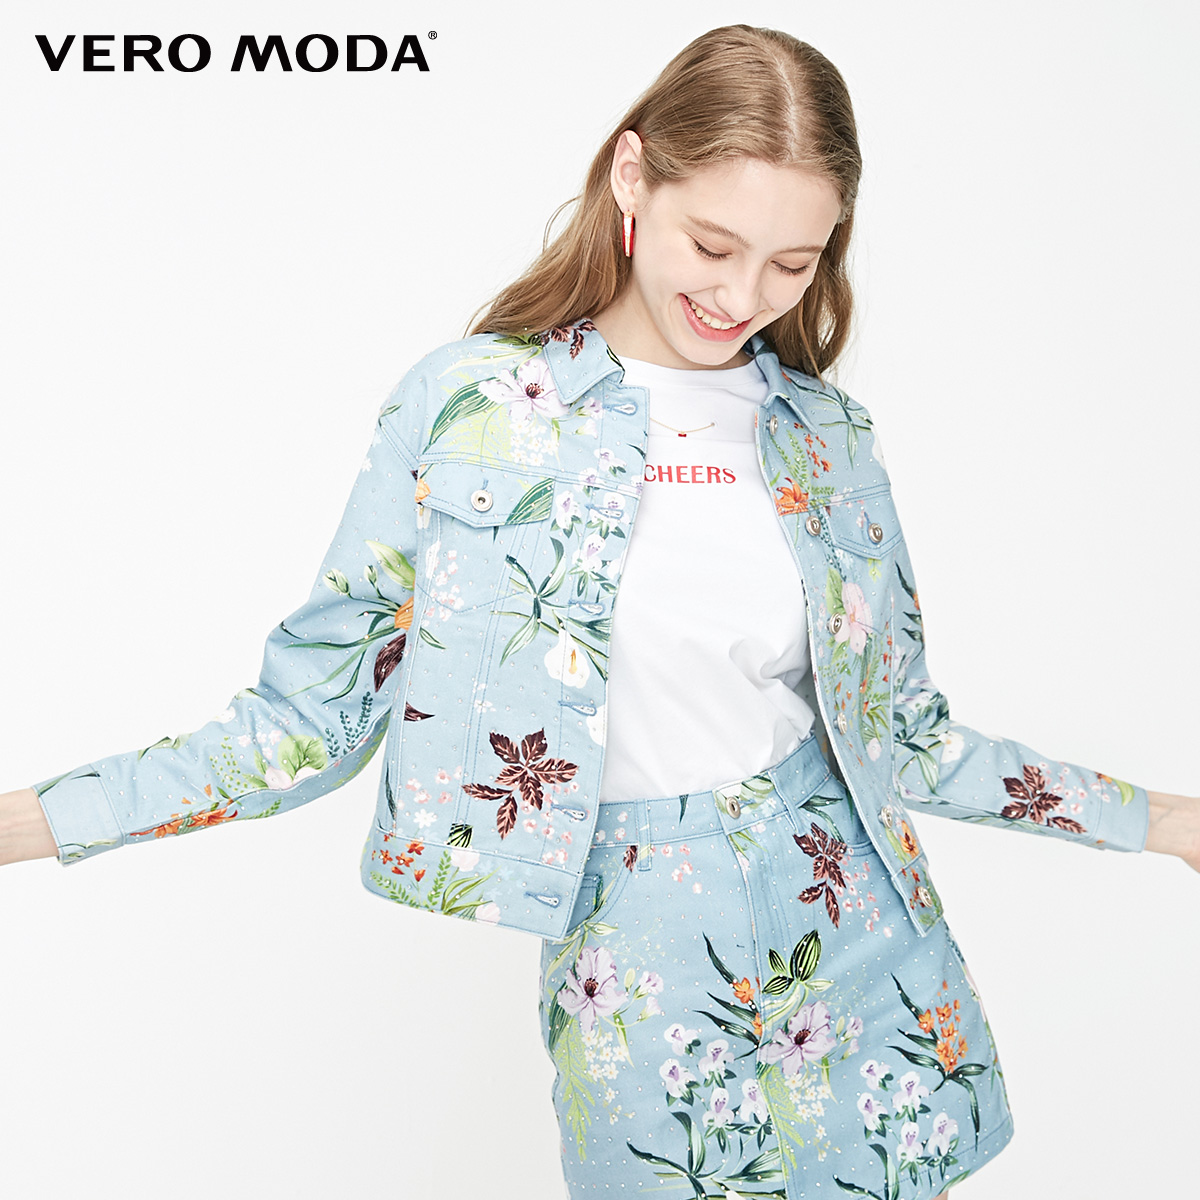 Vero Moda Women's 100% Cotton Printed Rhinestones Denim Jacket | 319257508